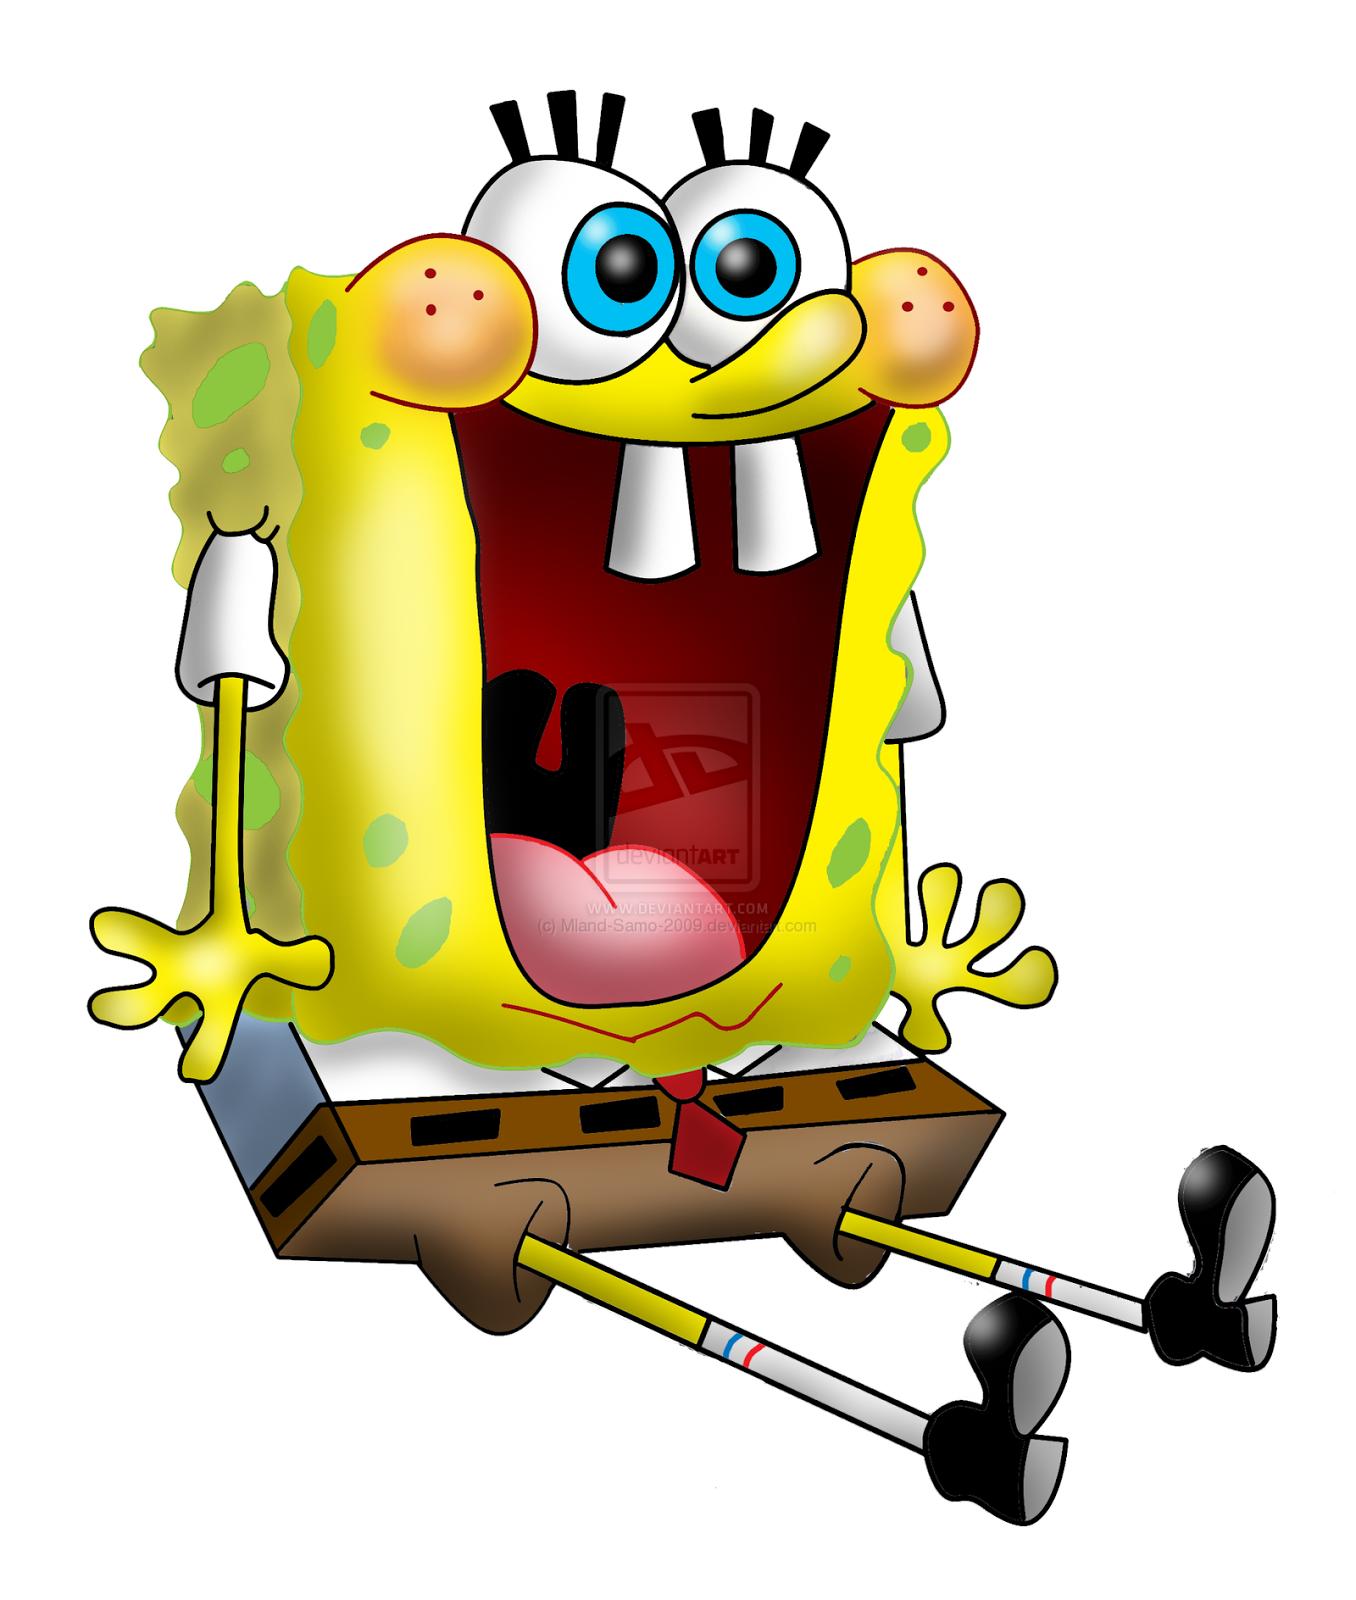 Oggy And The Cockroaches Wallpaper 3d American Top Cartoons Spongebob Squarepants